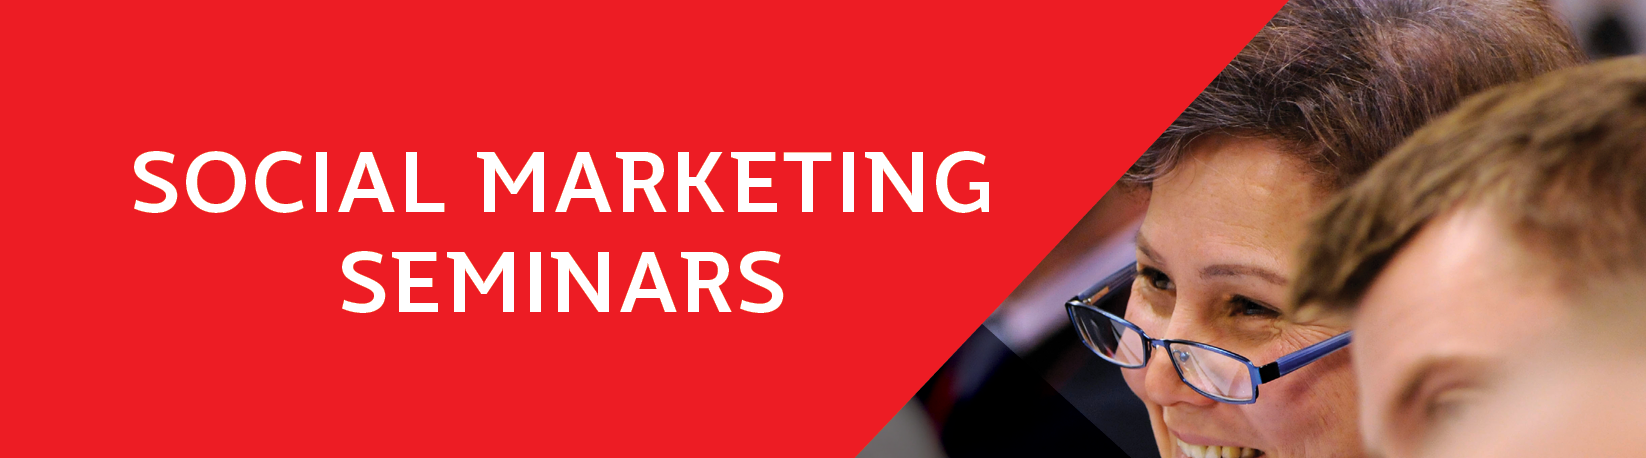 FREE Social Marketing Seminars